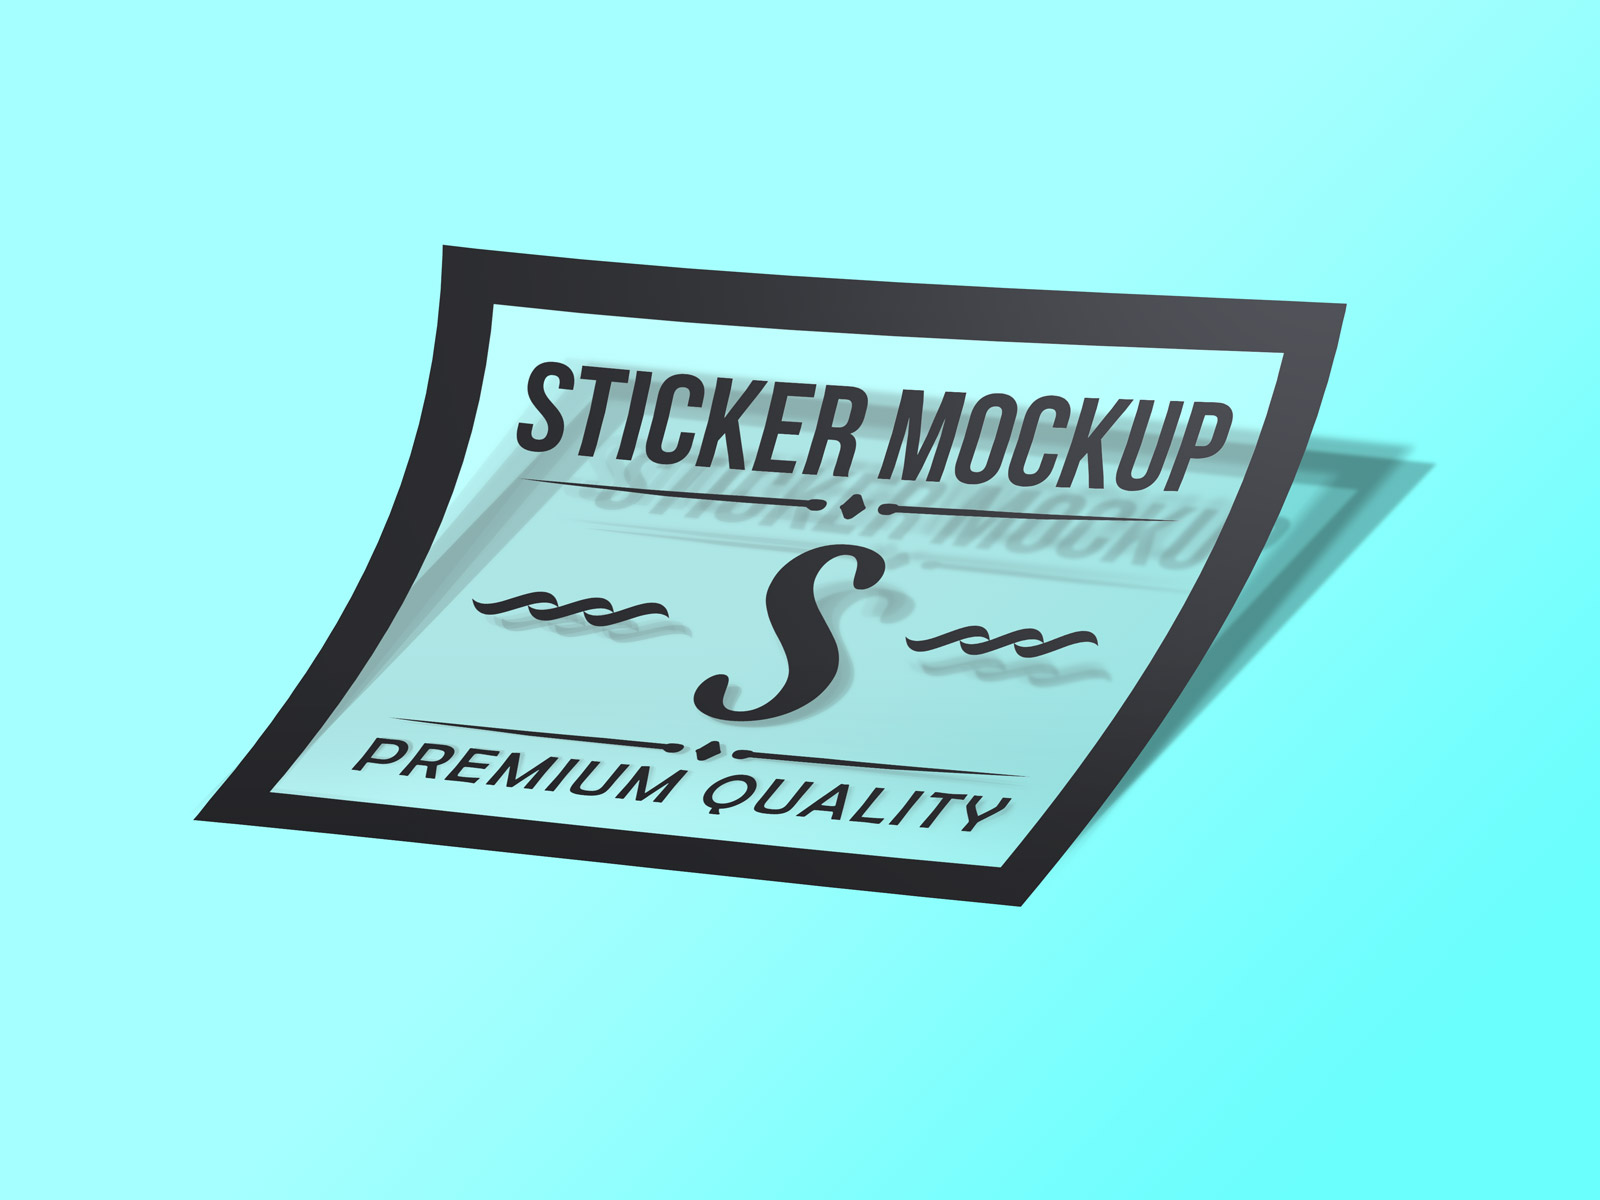 Free-Sticker-Mockup-PSD-4